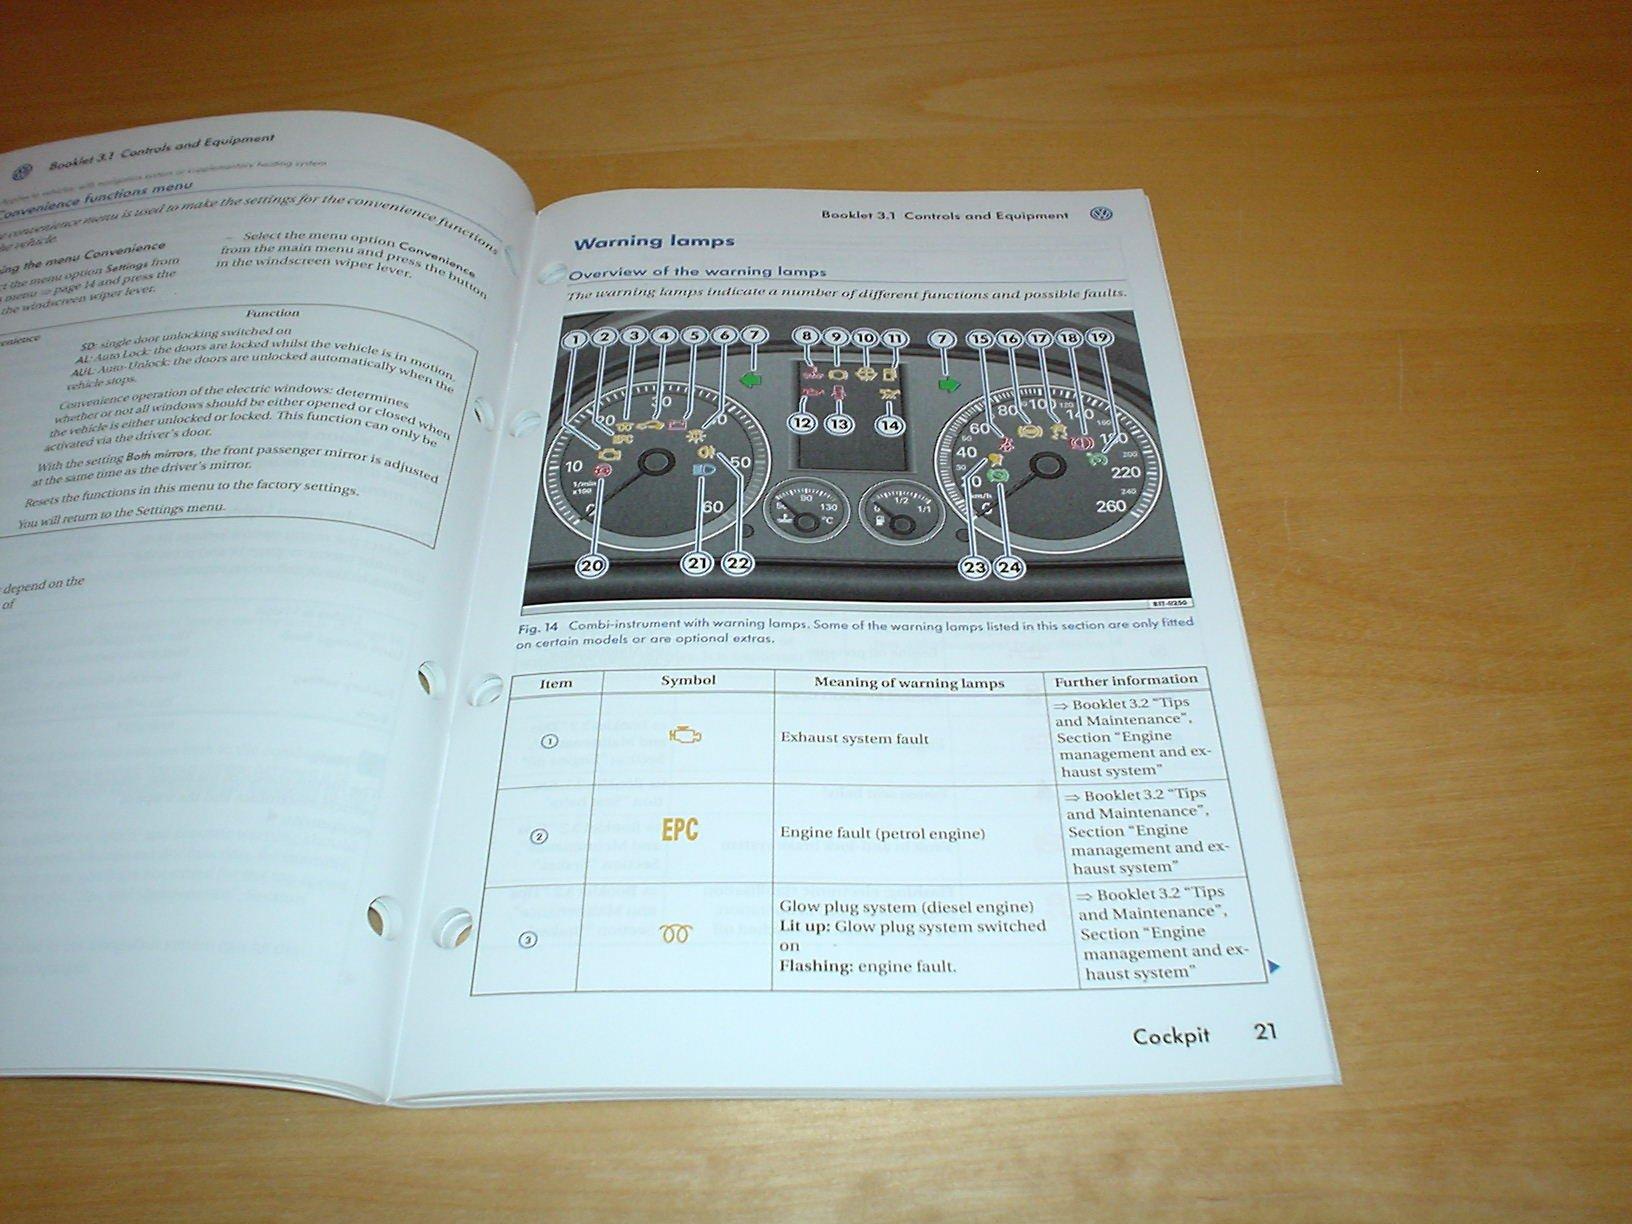 Volkswagen Touran Owners Manual Handbook C W Wallet 2003 2007 Vw Wiring Diagram Pdf 16 20 Litre Petrol 19 Tdi Diesel Engine 17 Sdi